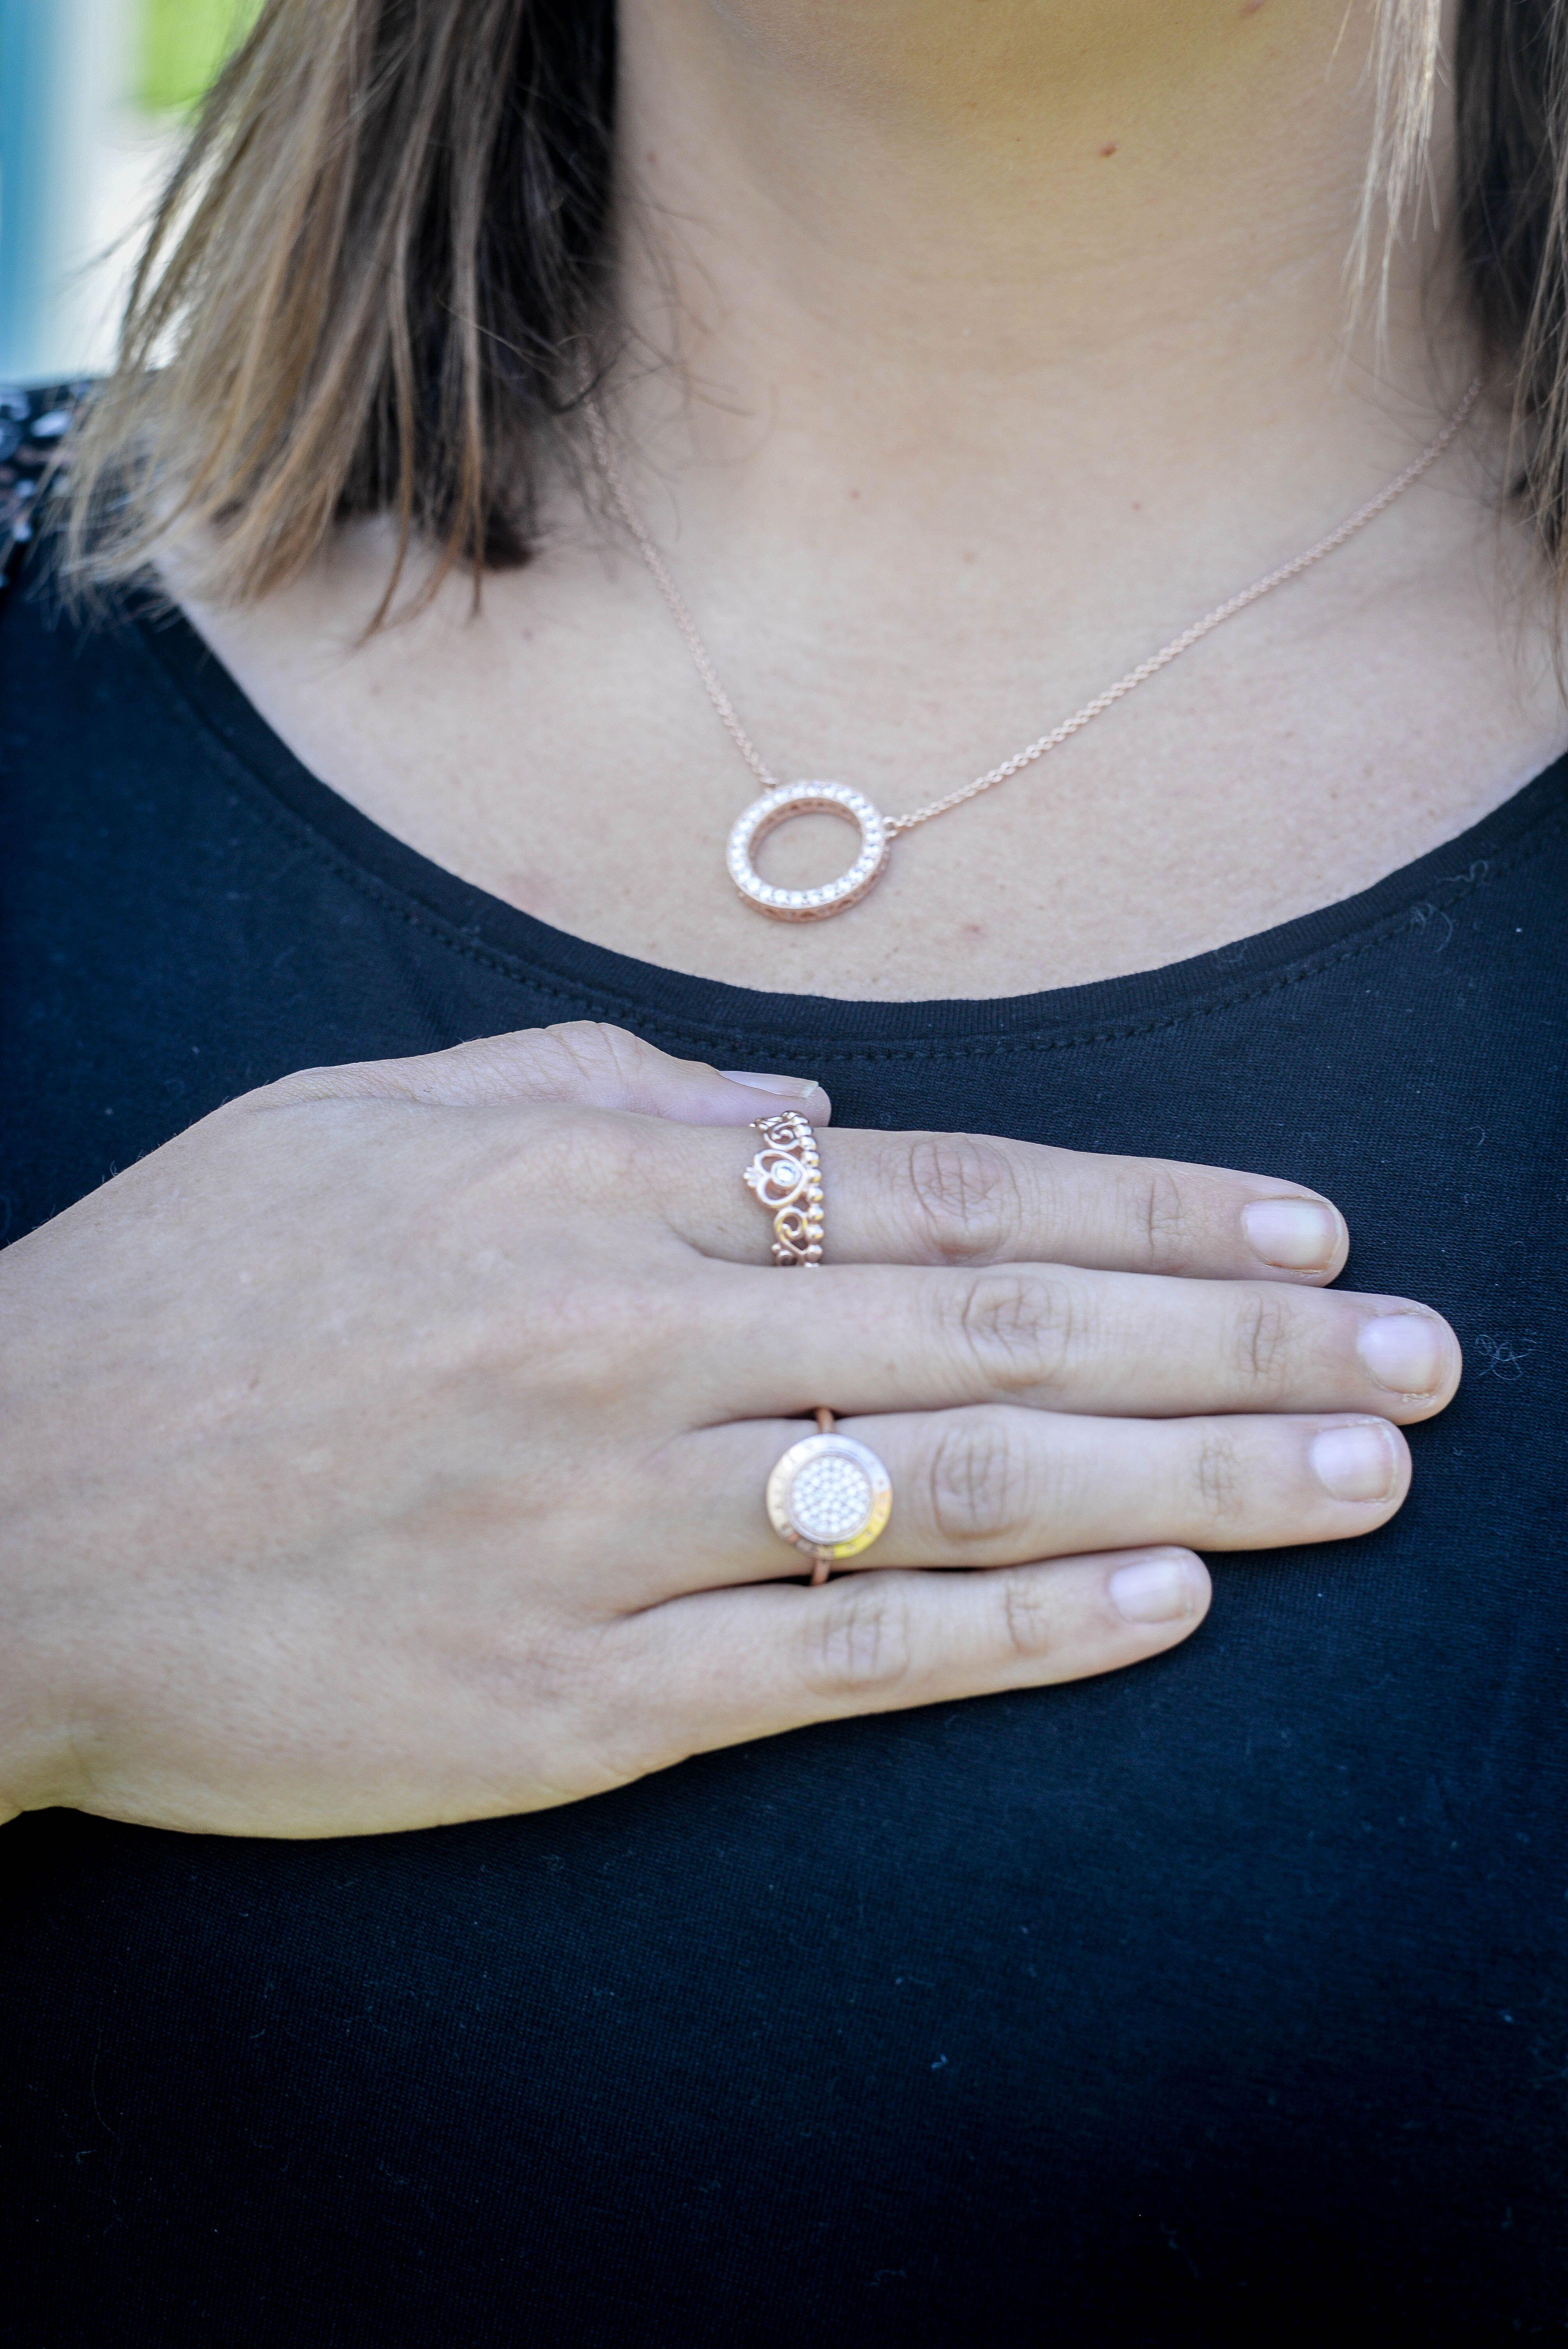 30+ White jewelry fairmont west virginia viral